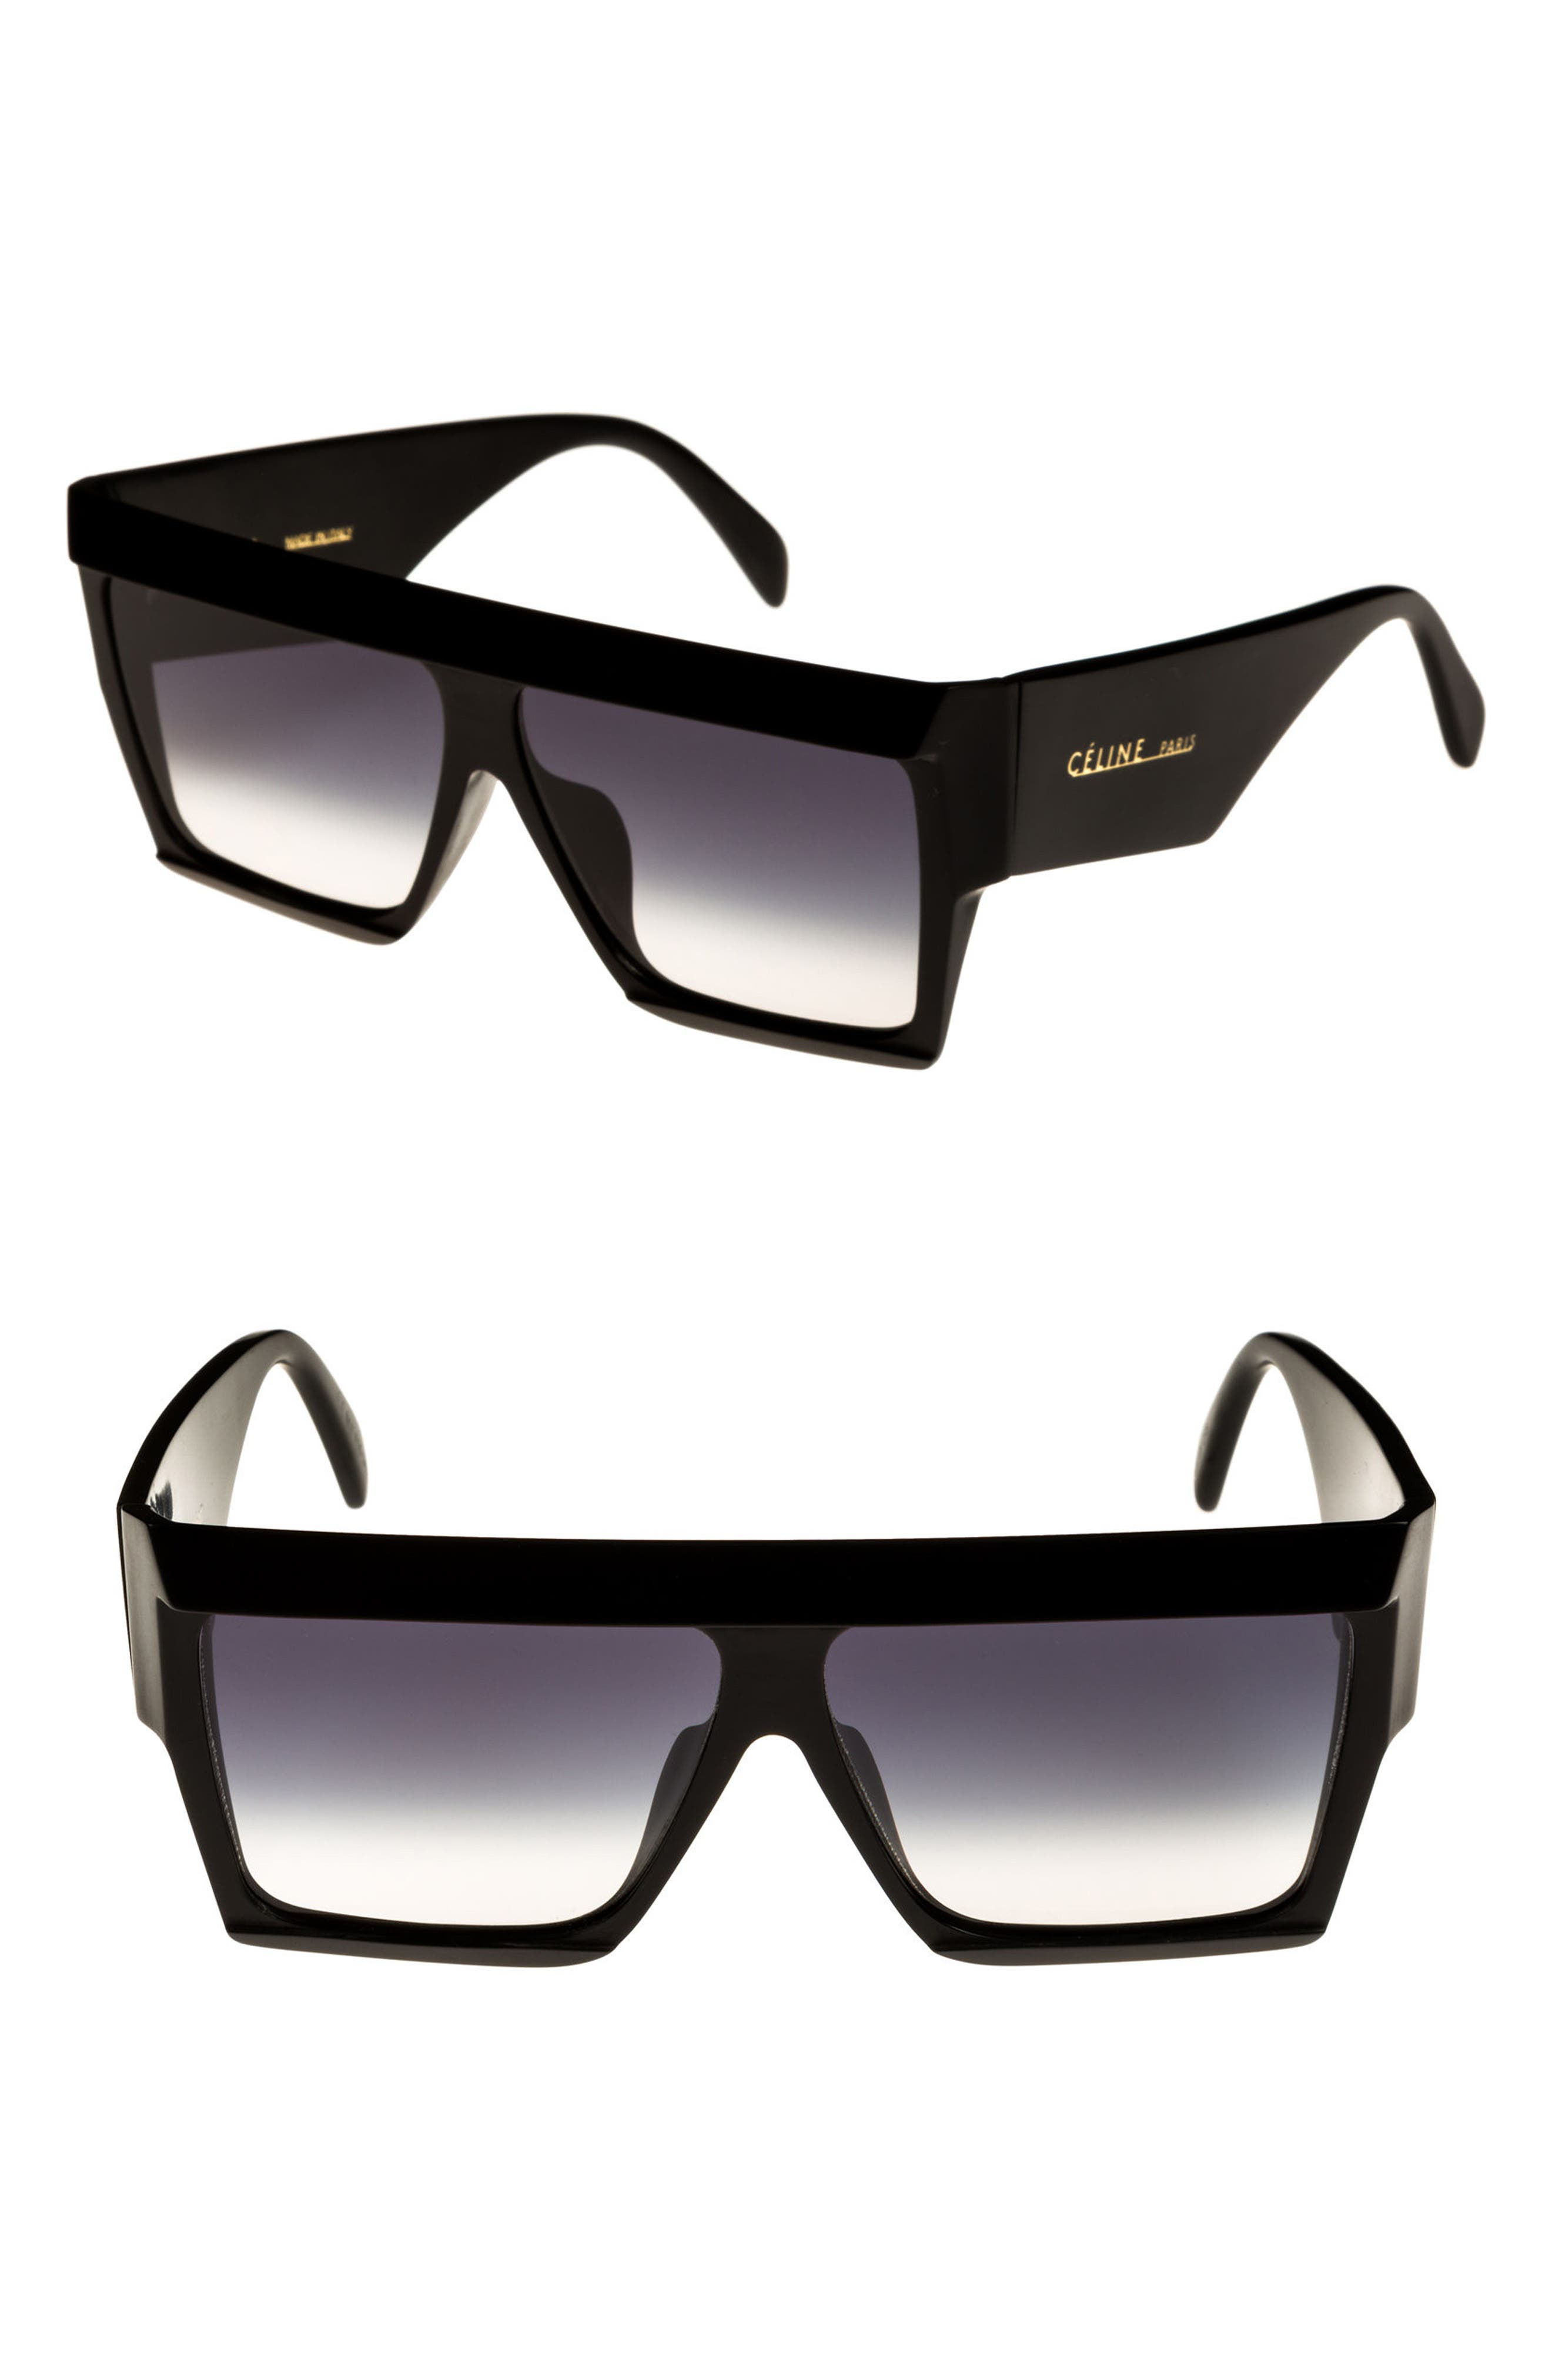 Céline 60mm Flat Top Sunglasses